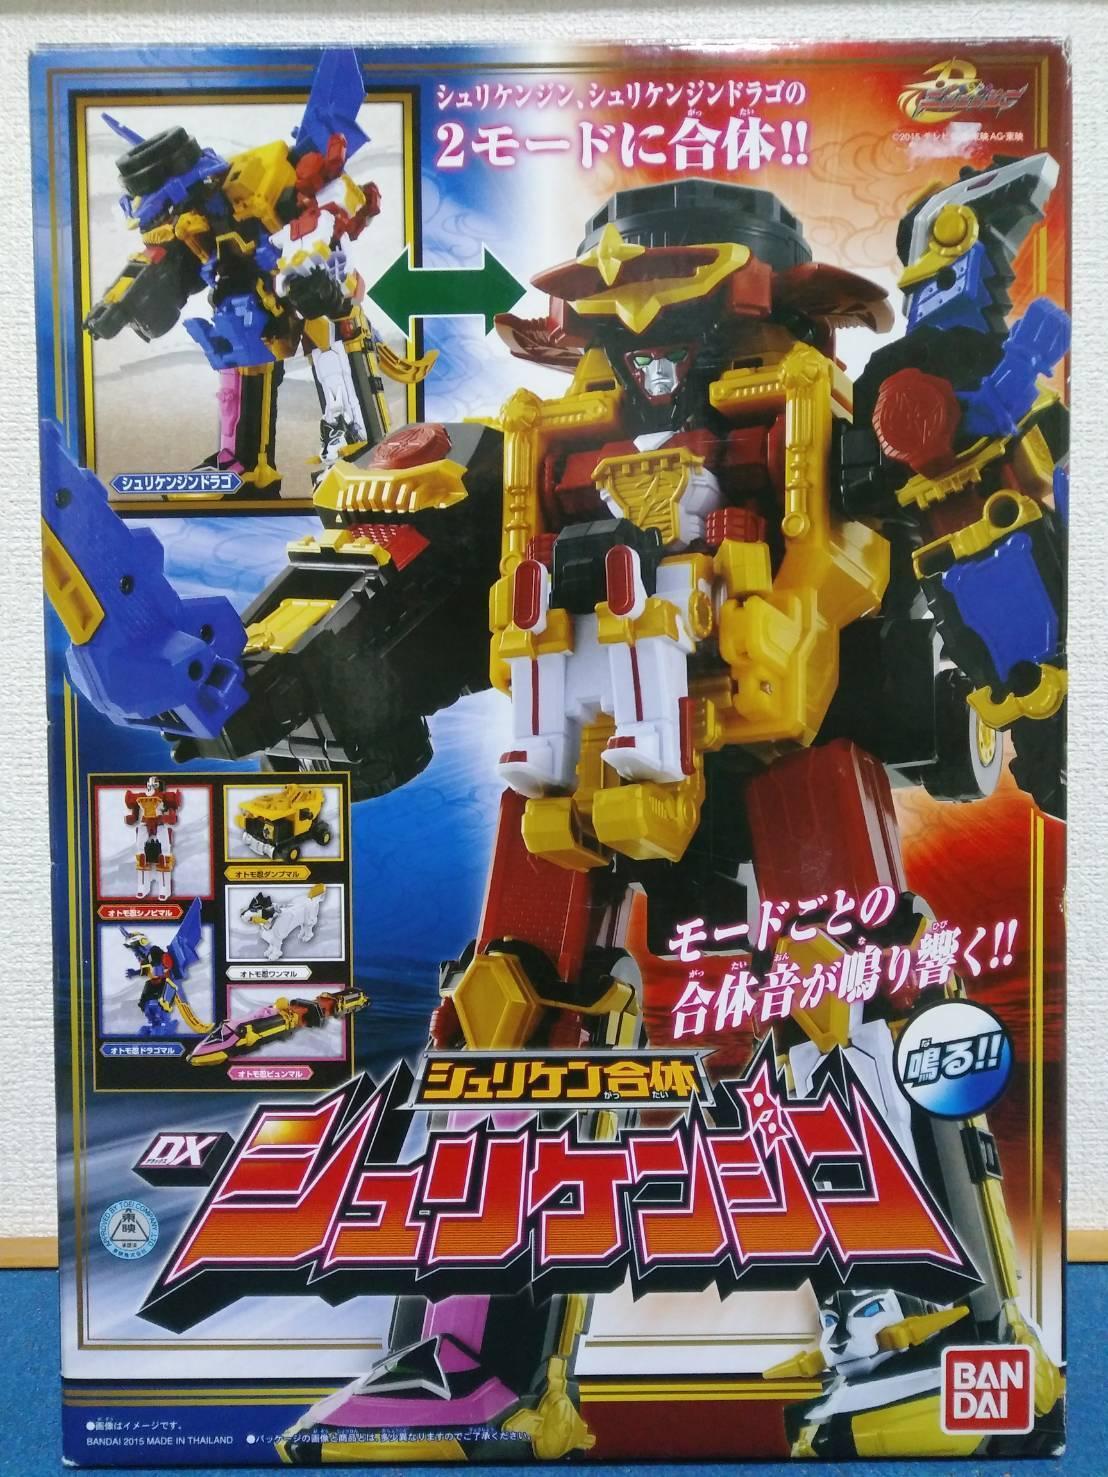 energia Rangers Shuriken Sentai Ninja Steel NINNINGER DX Shurikenjin Megazord JPN